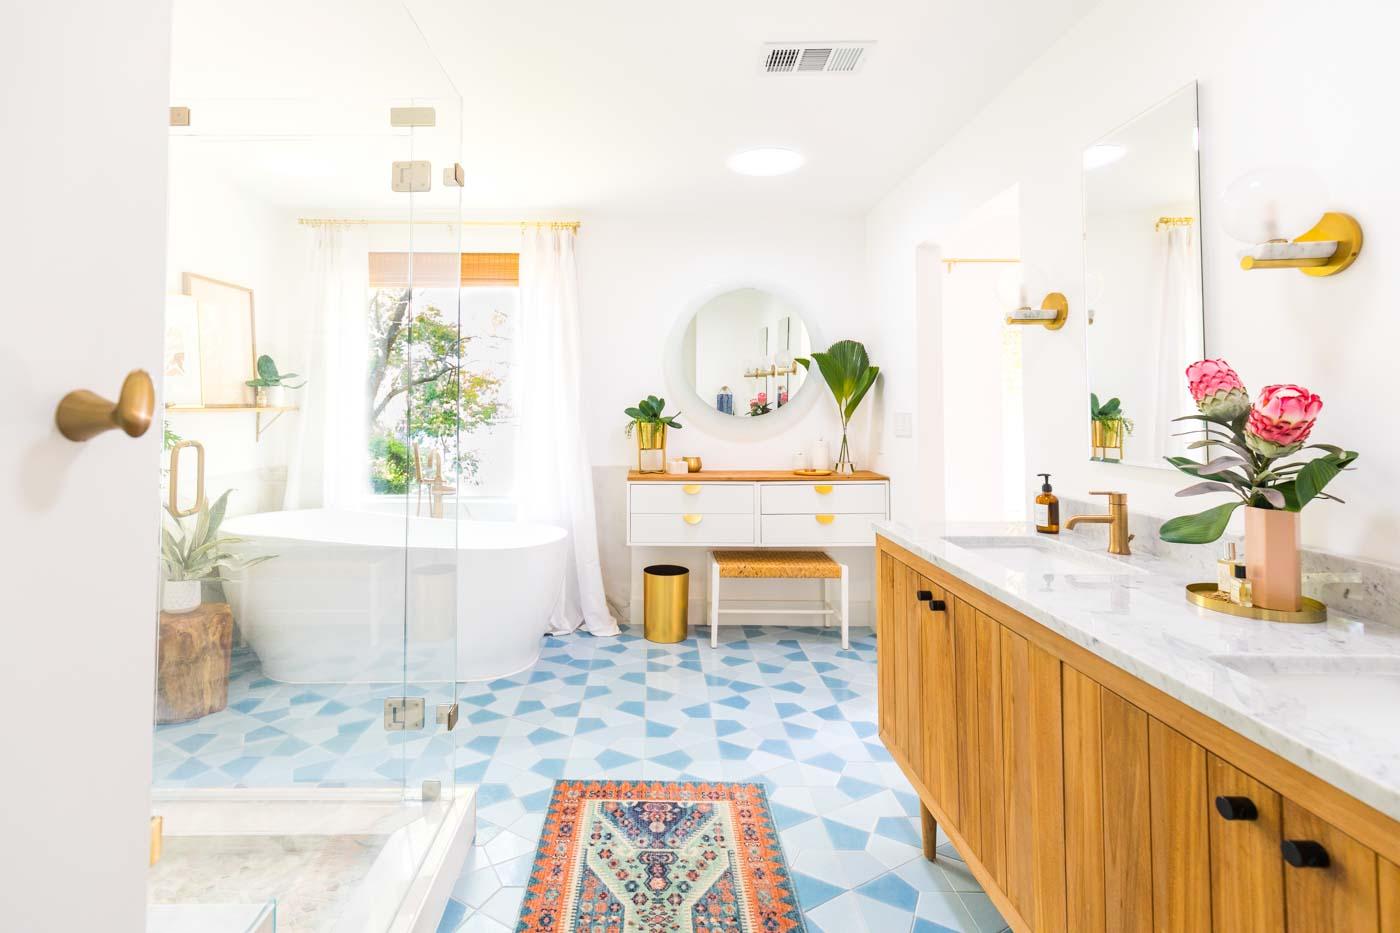 horizontal photo of a master bathroom remodel